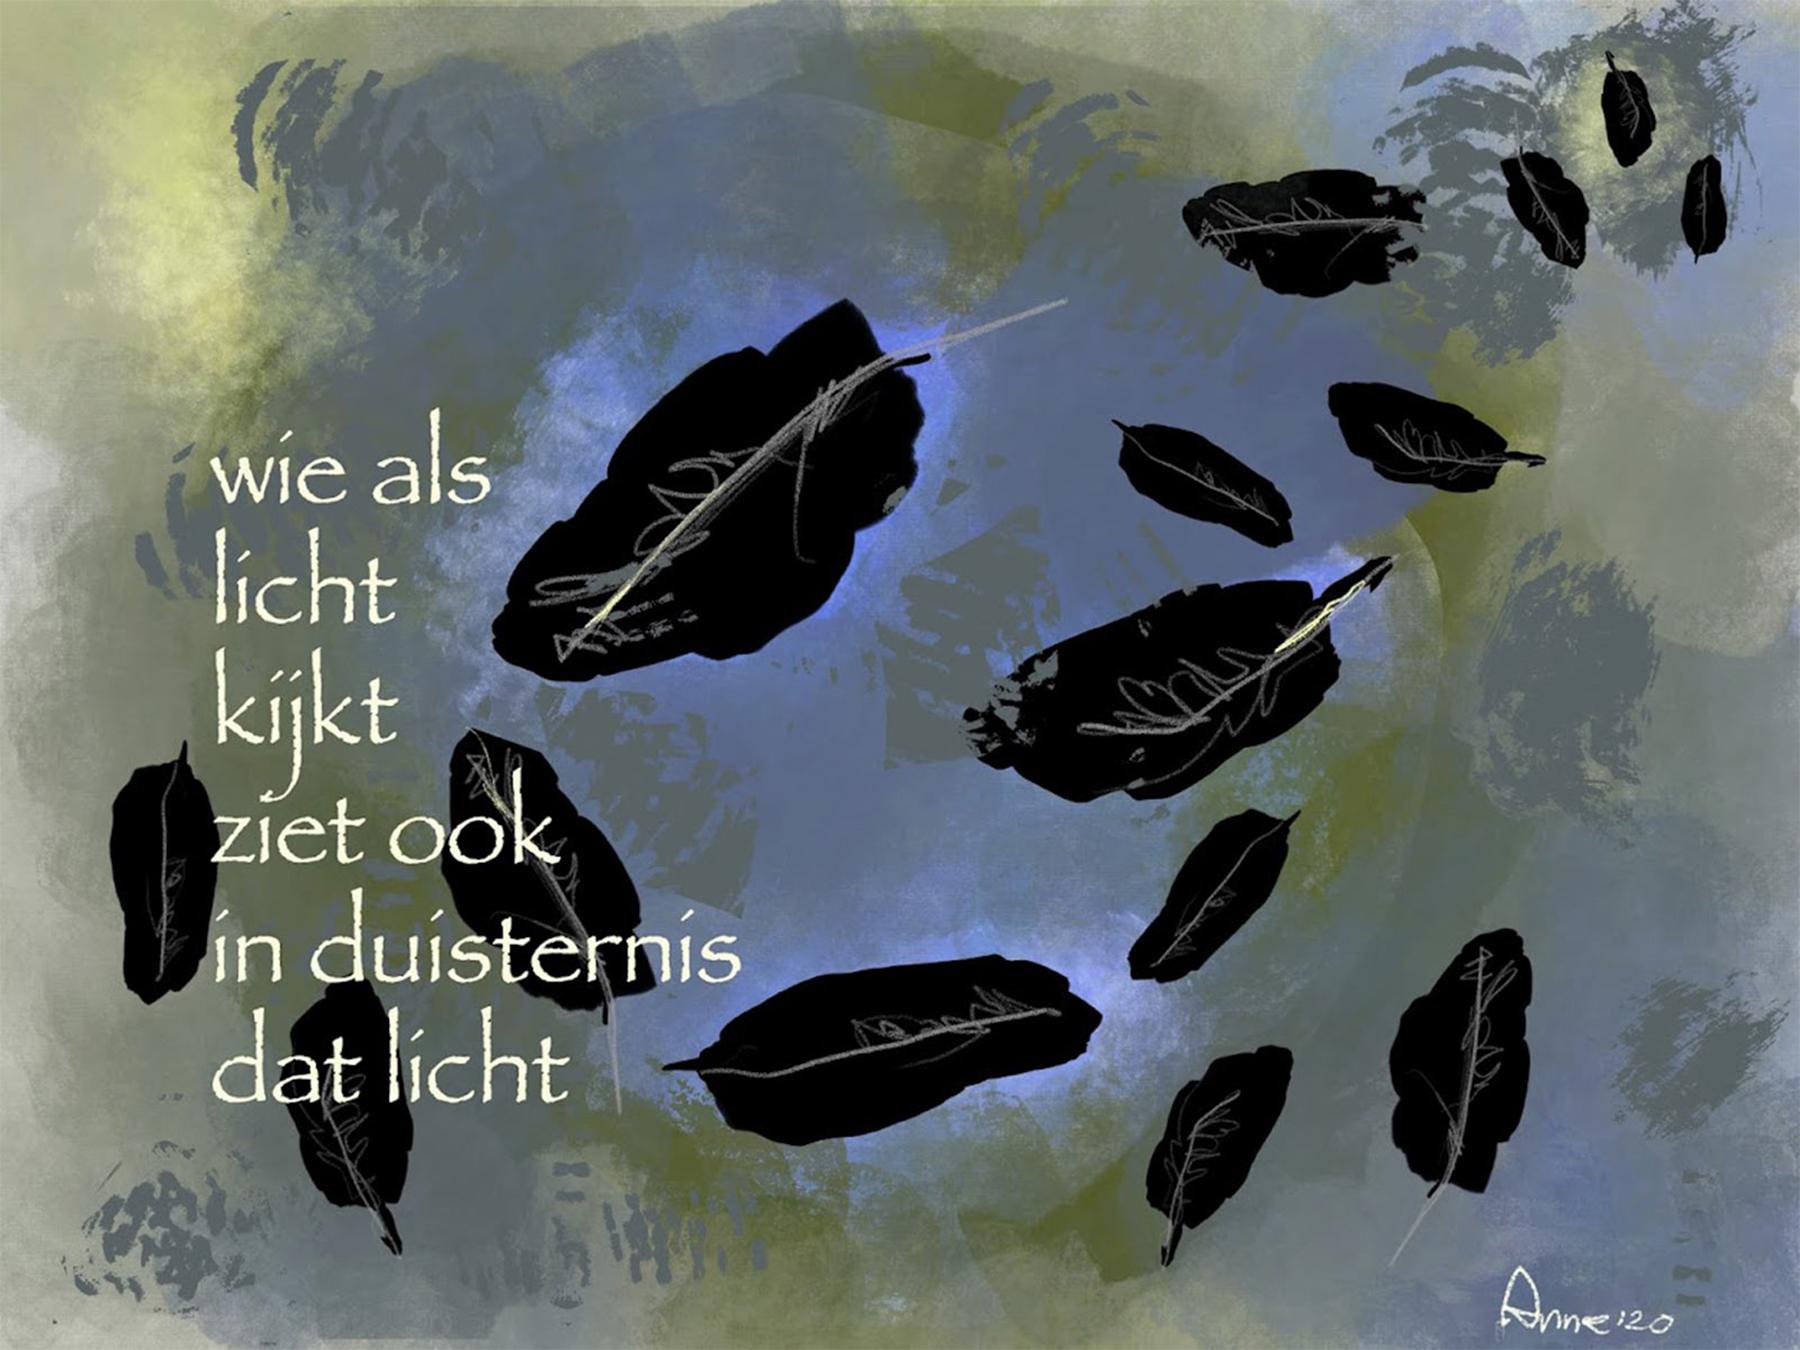 wie als licht kijkt ziet ook de in duisternis dat licht © Anne-Riet de Boer